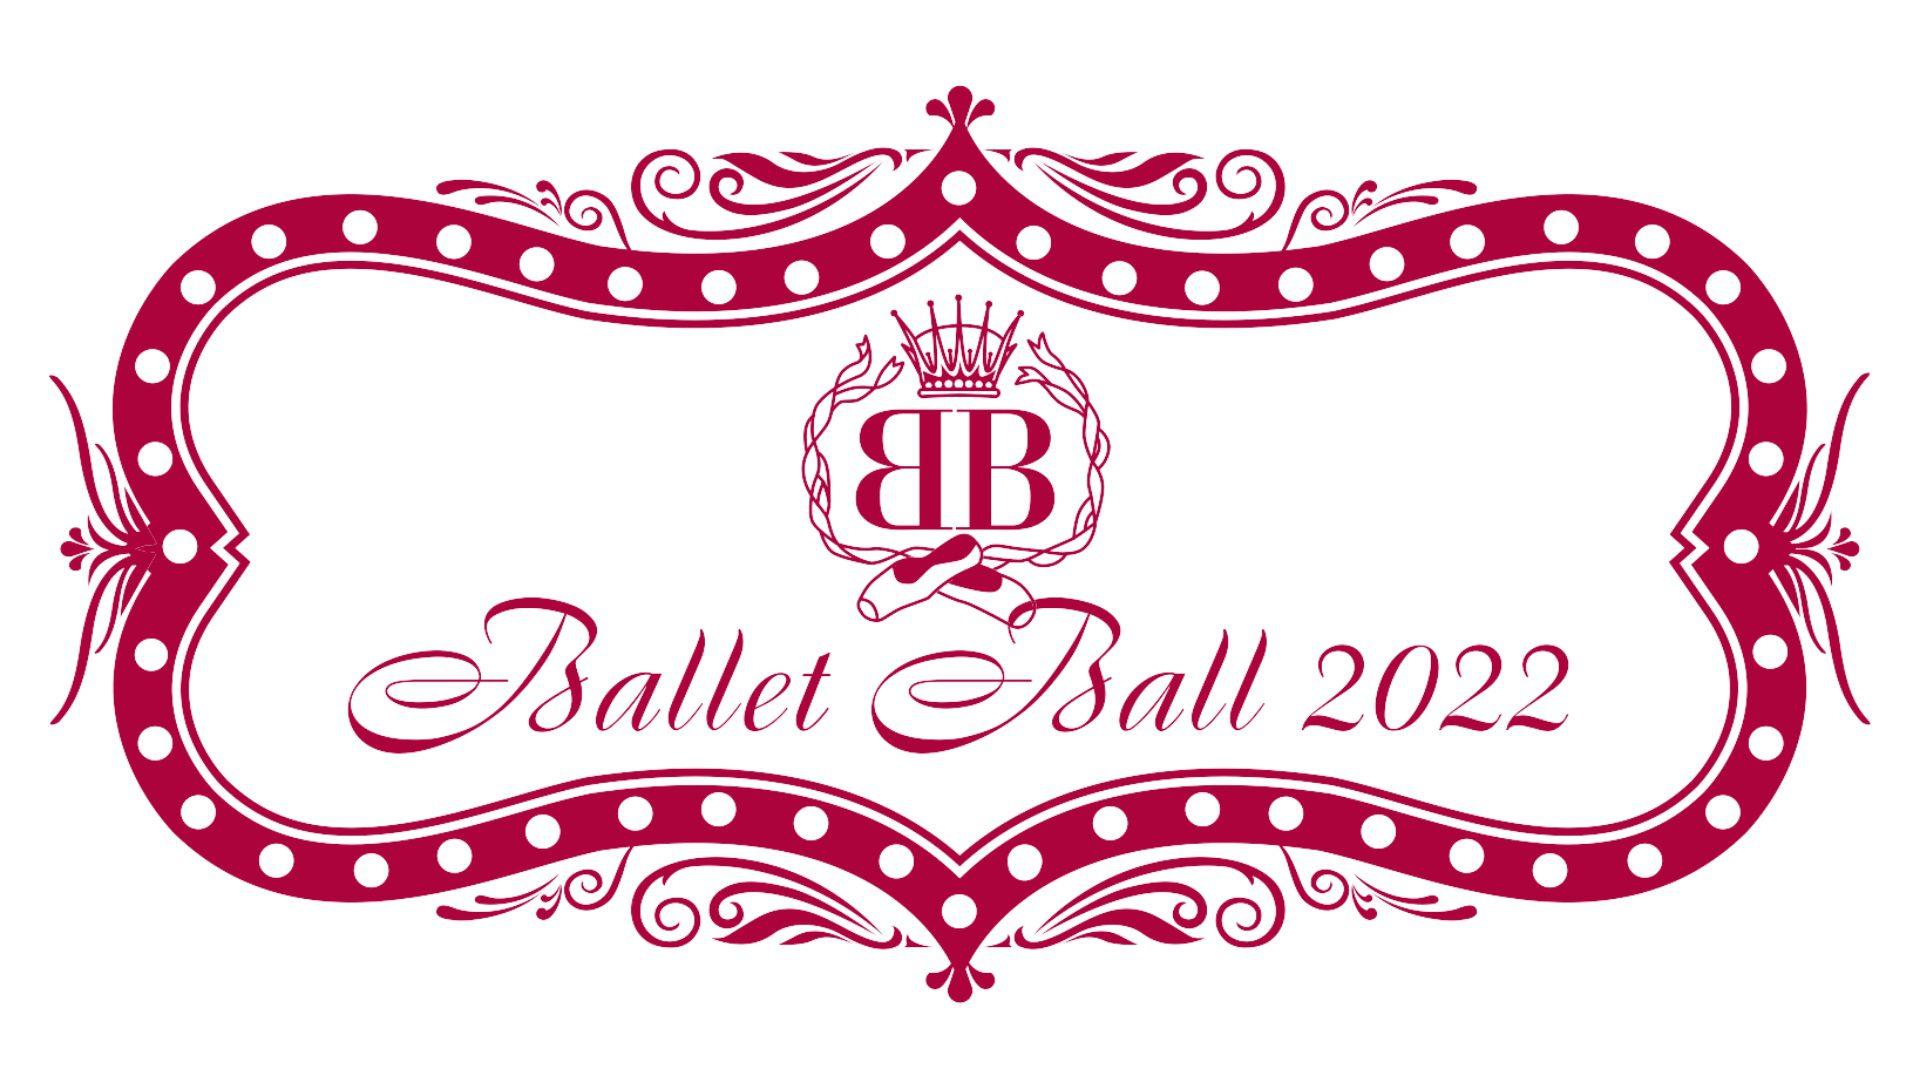 Nashville Ballet - Ballet Ball 2022